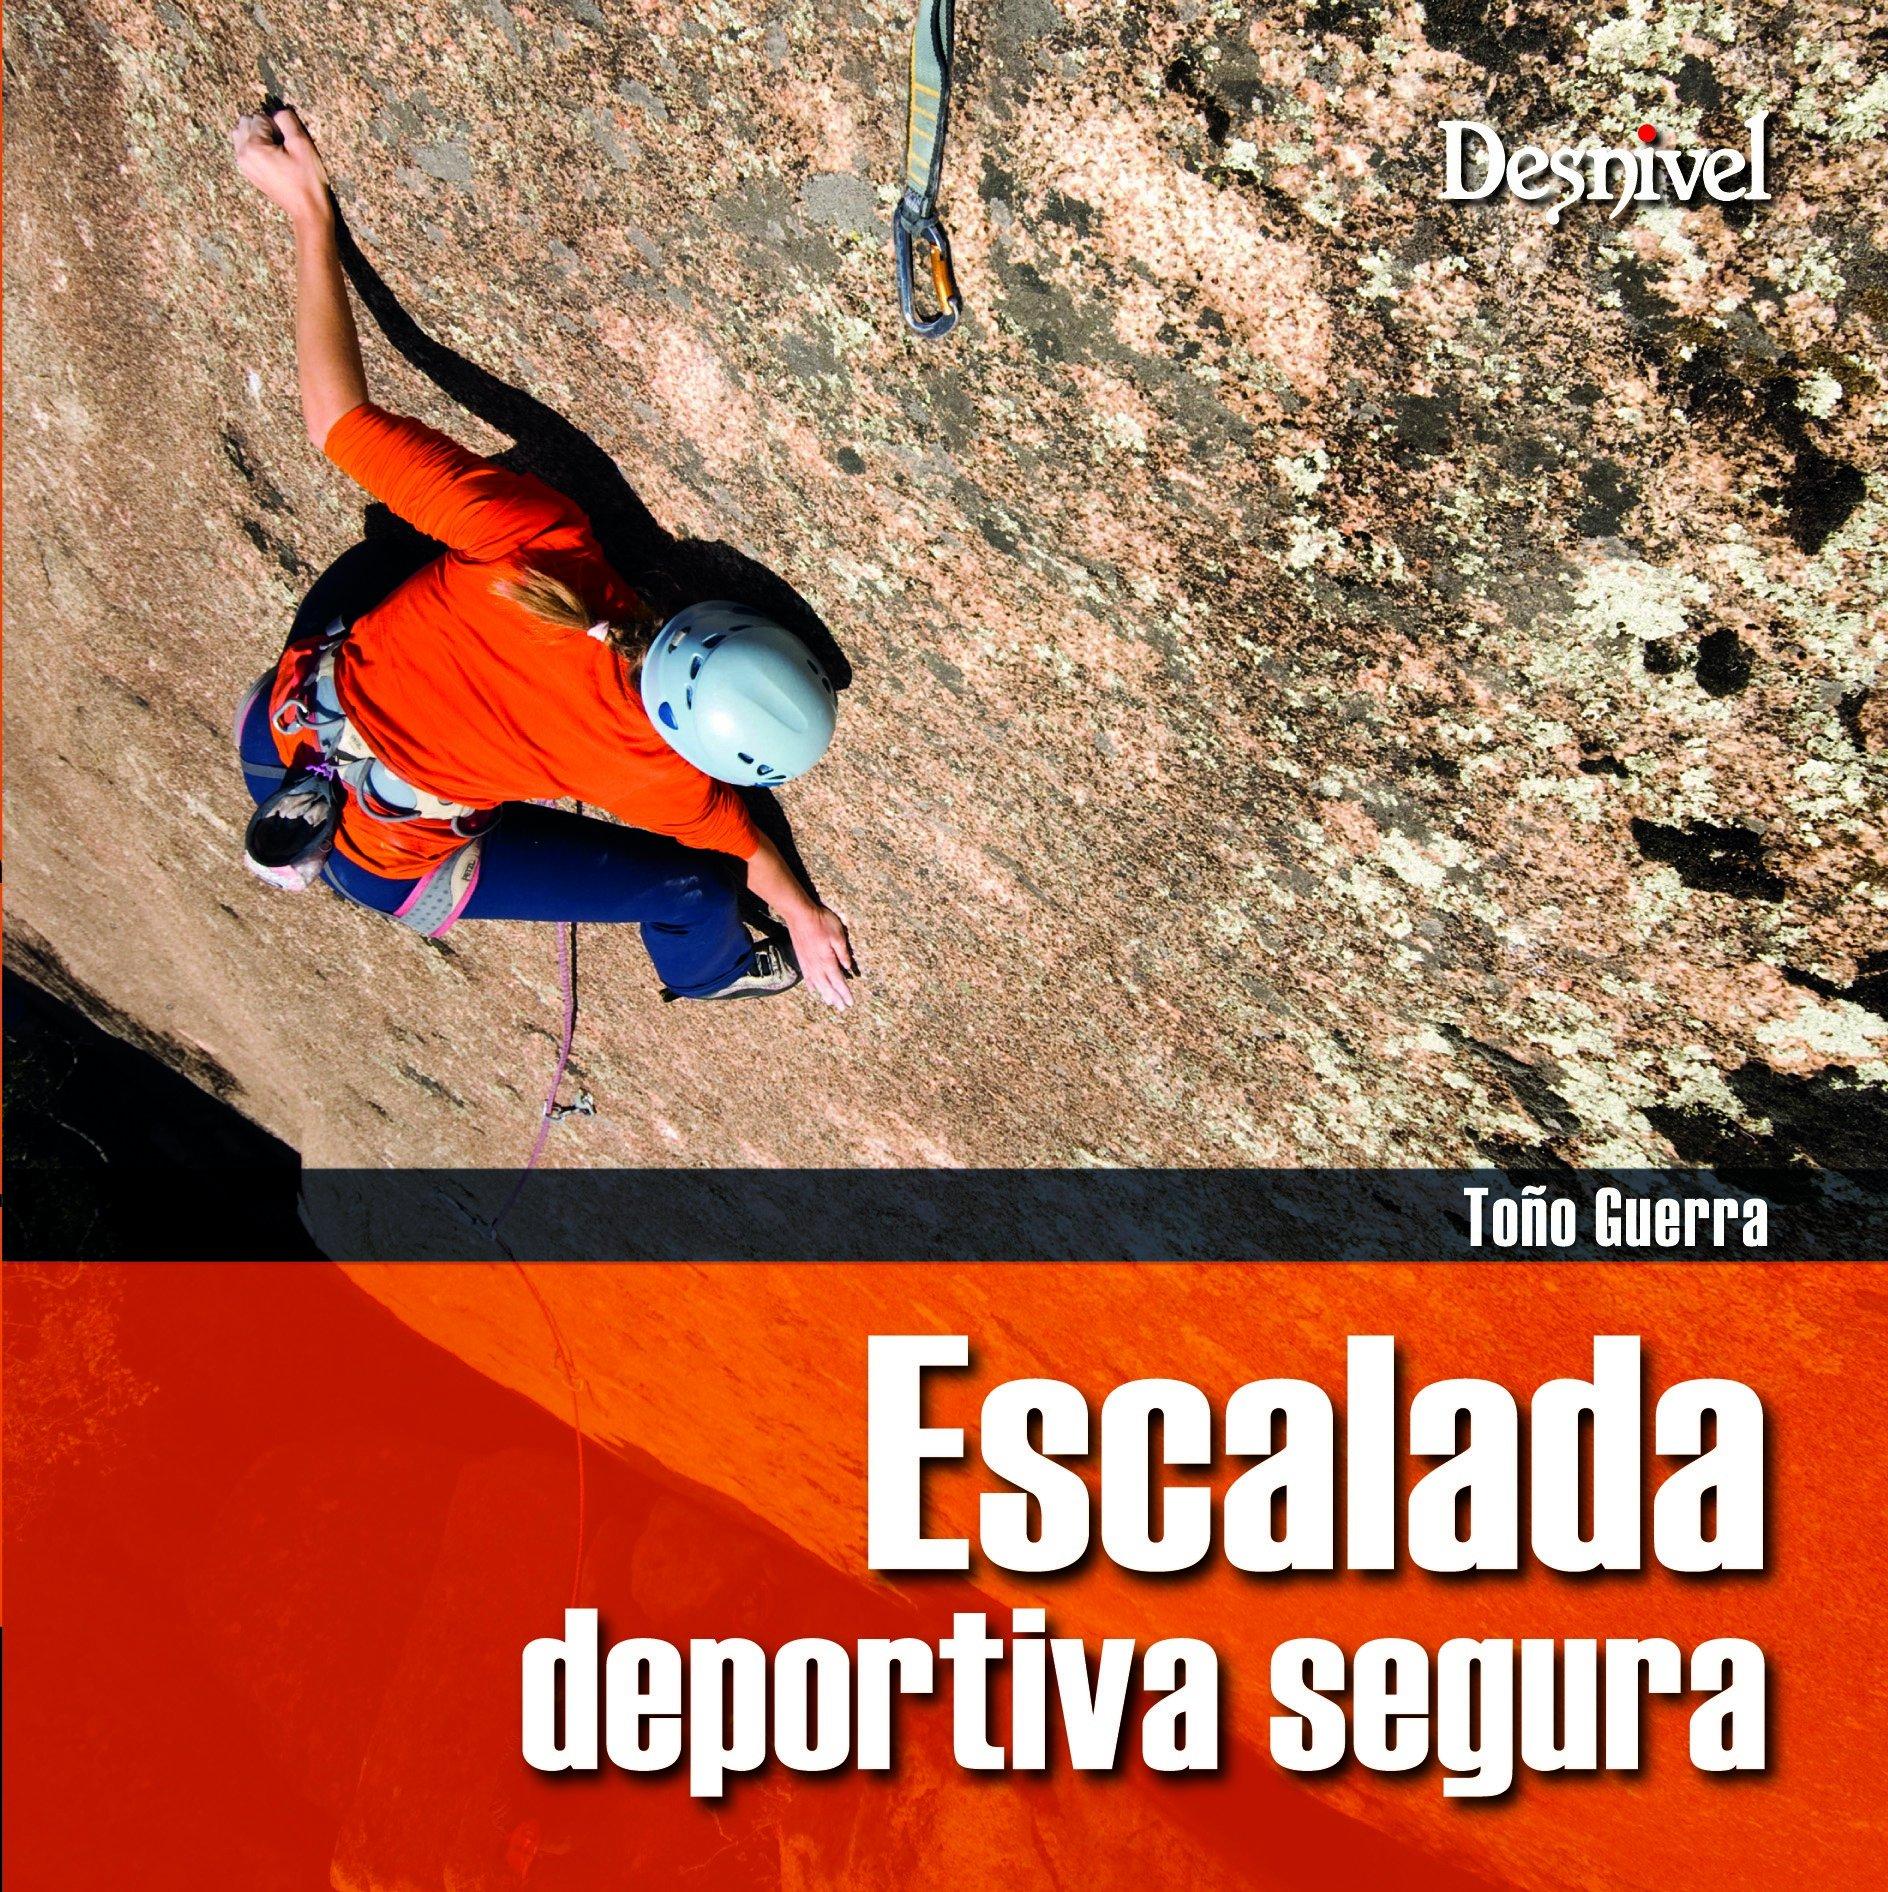 Escalada deportiva Segura (Manuales (desnivel)): Amazon.es ...